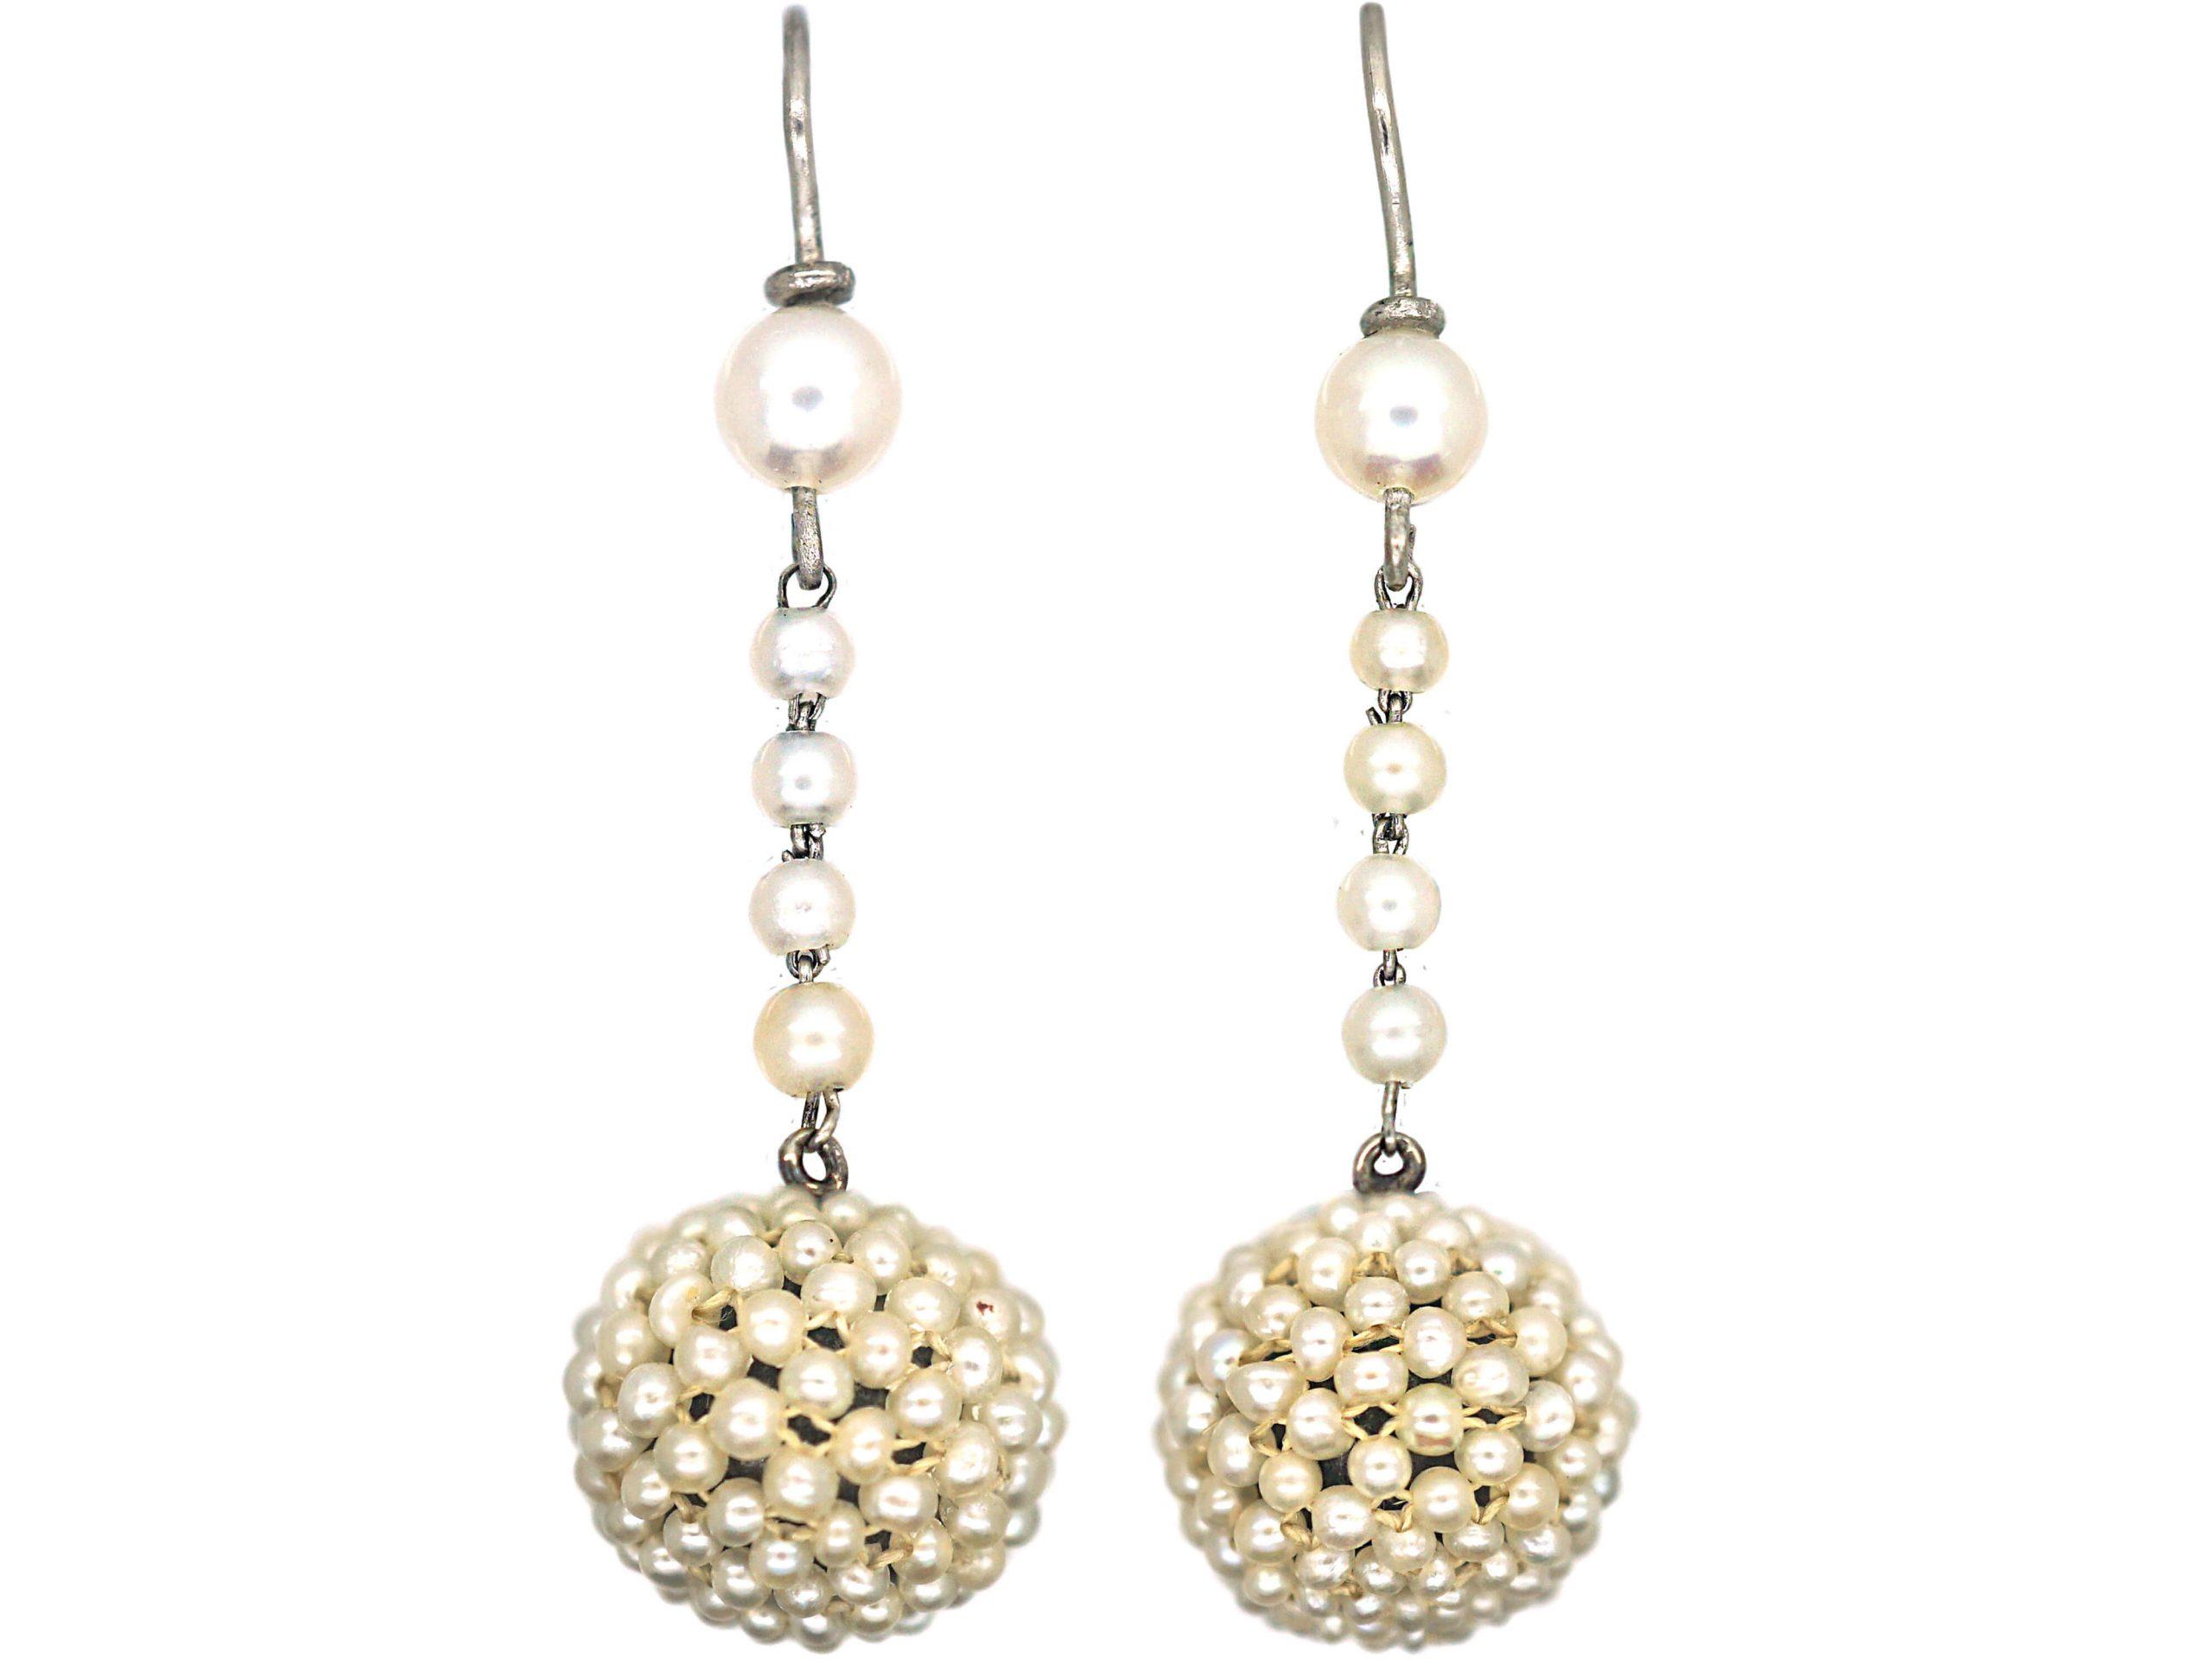 Edwardian Platinum & Natural Pearl Drop Earrings